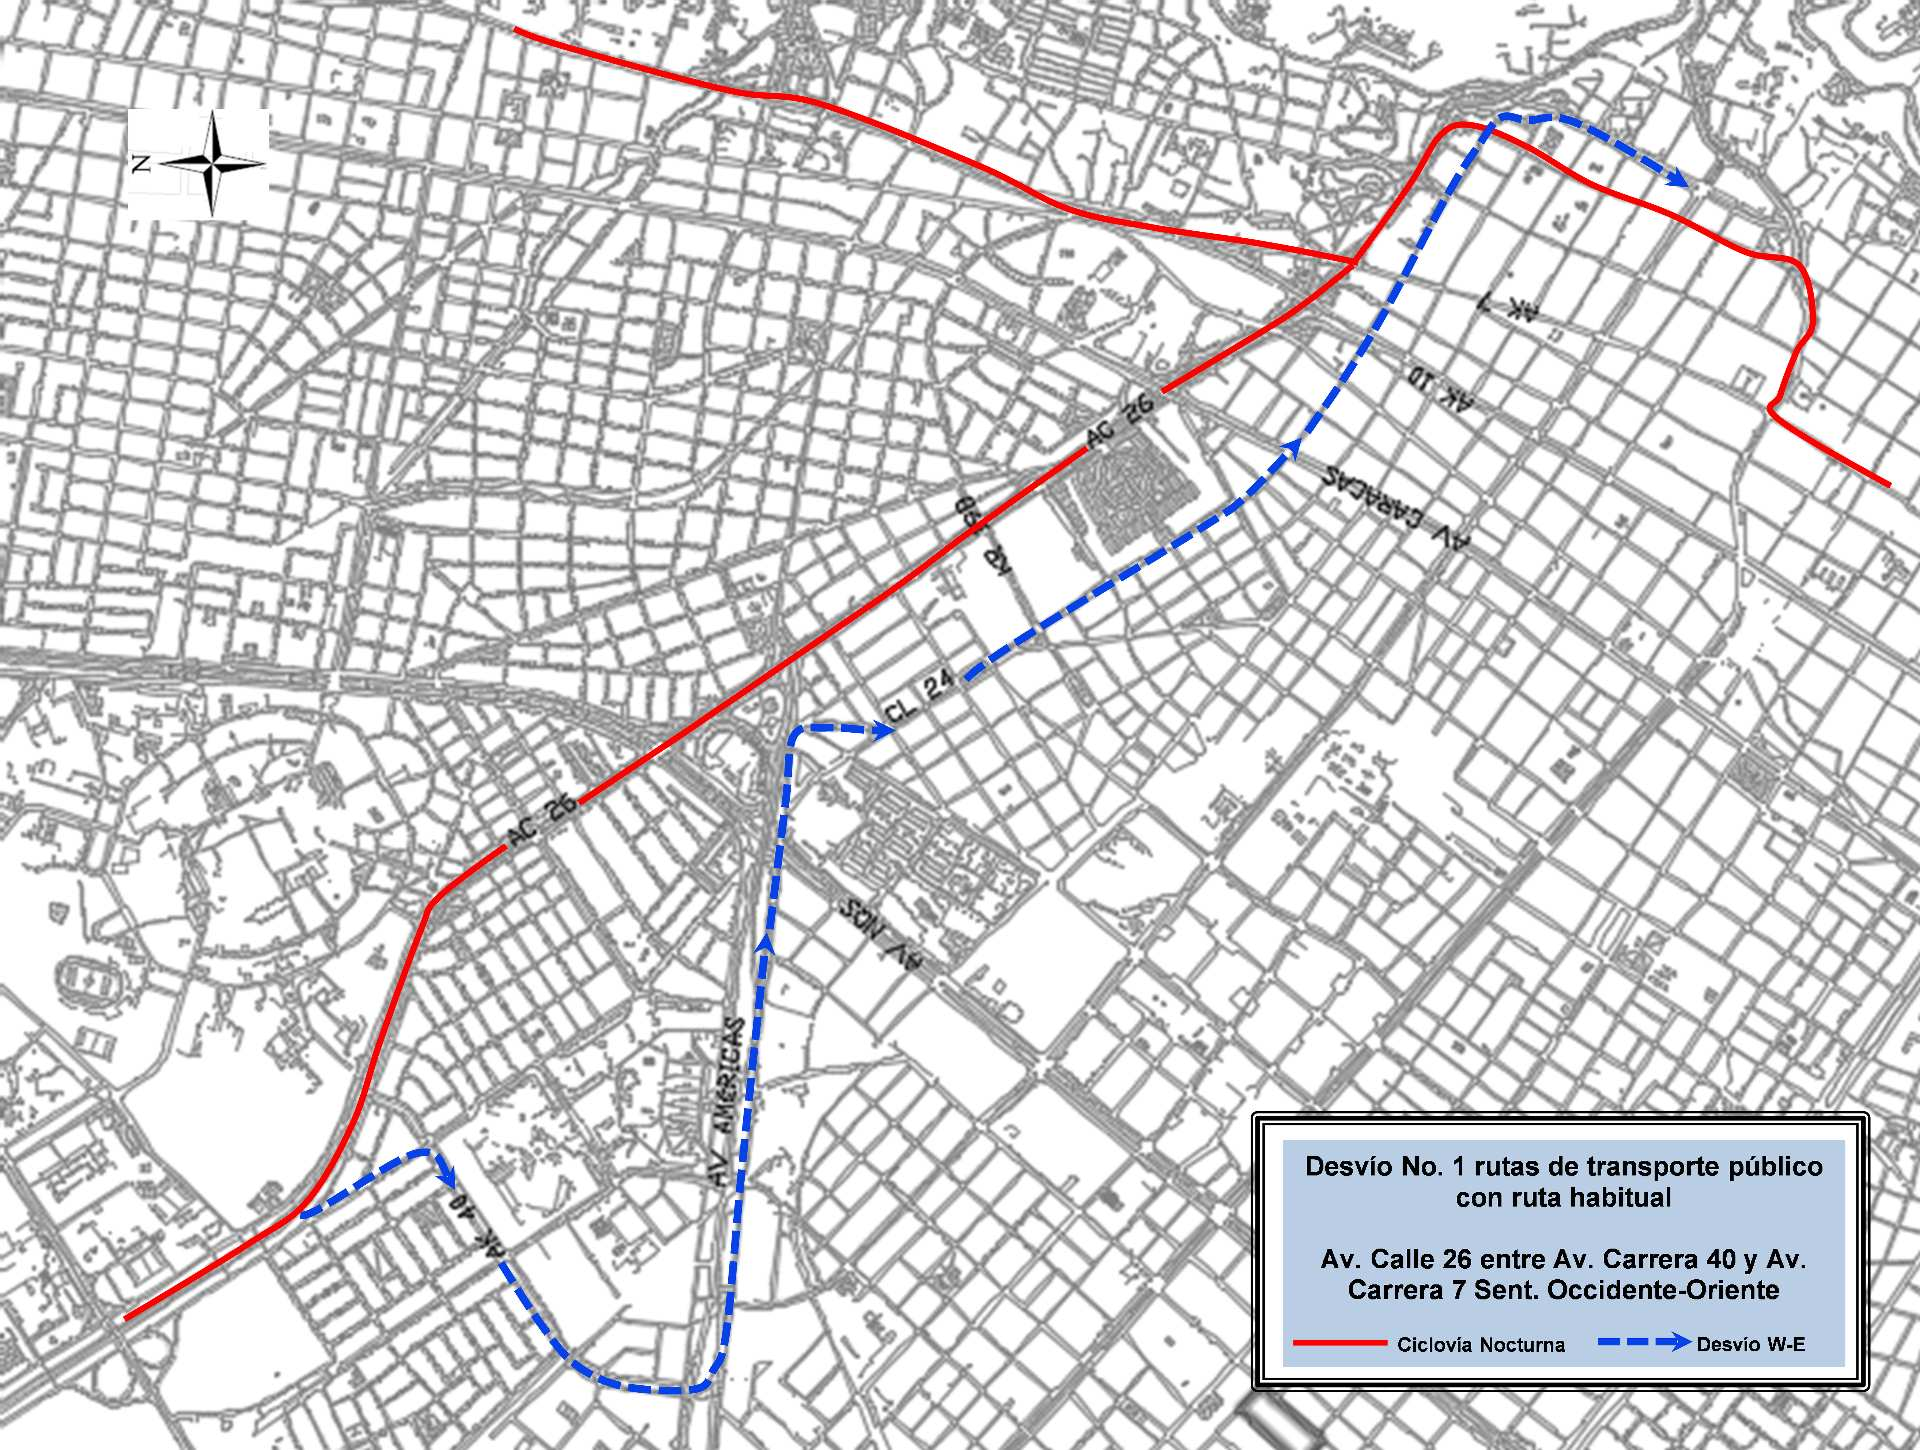 Mapa 7 - desvíos - ciclovía nocturna